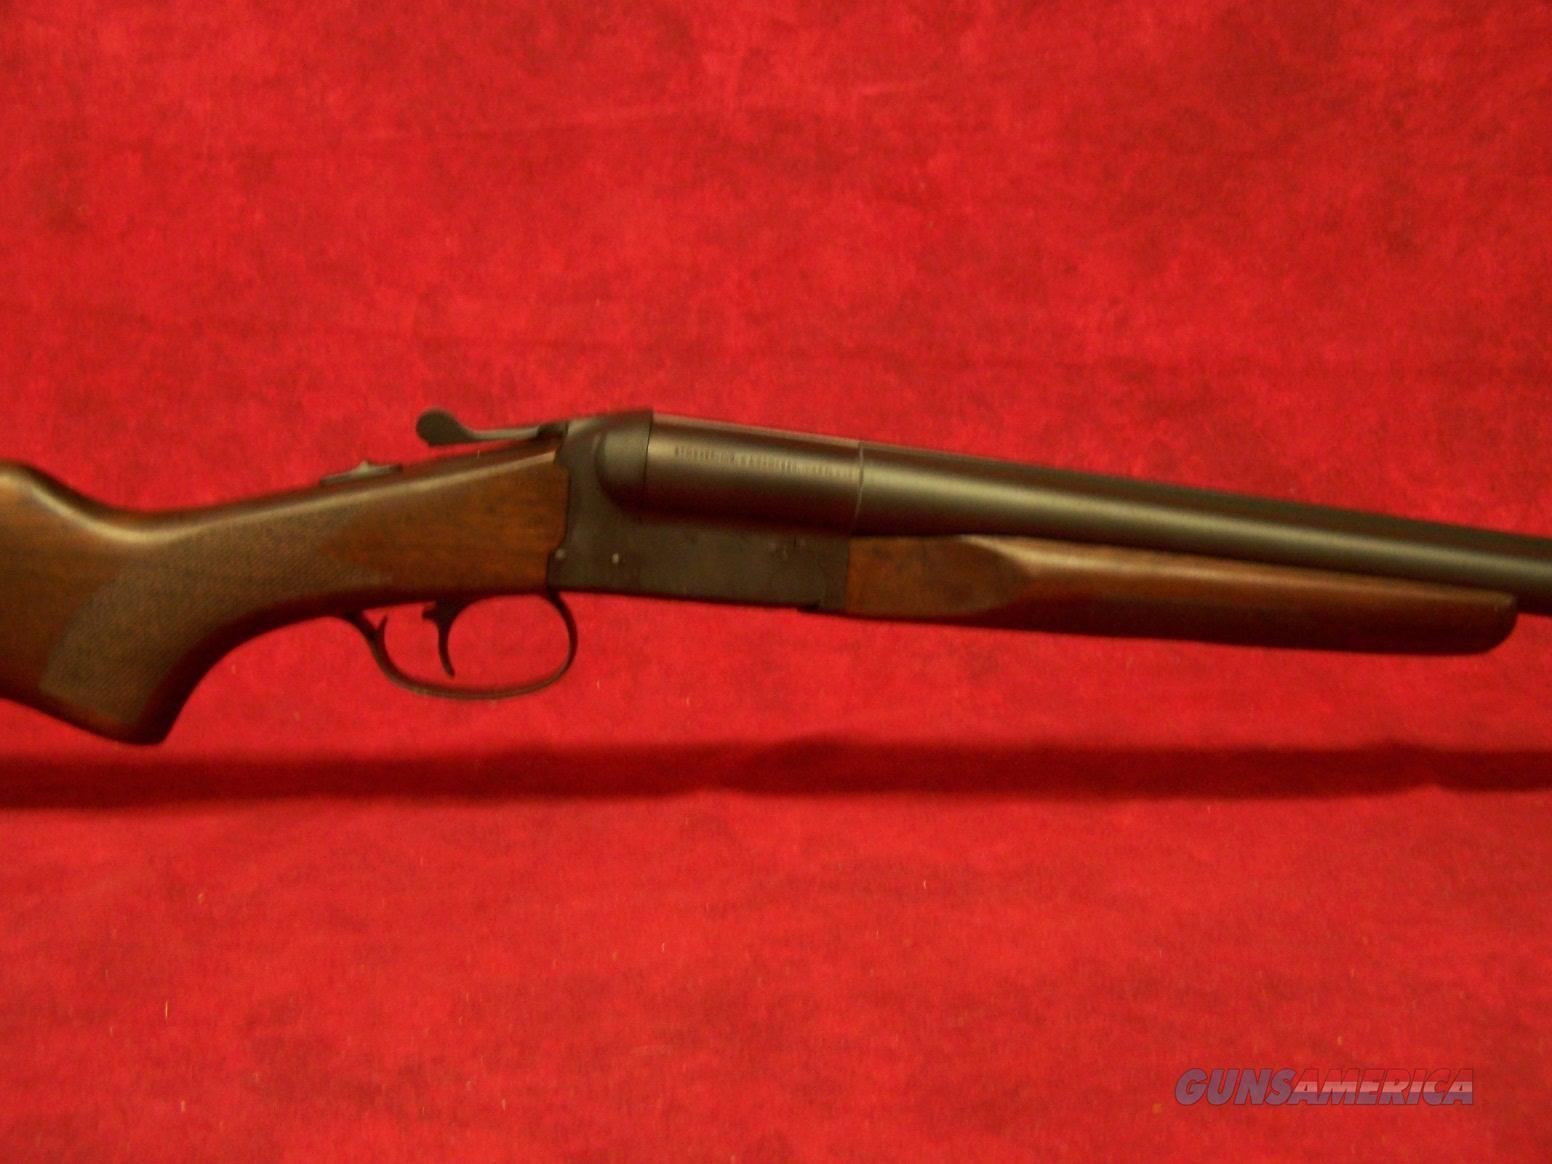 "Stoeger Uplander Longfowler 12Ga 3"" SxS A-Grade Satin Walnut 30"" (31062)  Guns > Shotguns > Stoeger Shotguns"